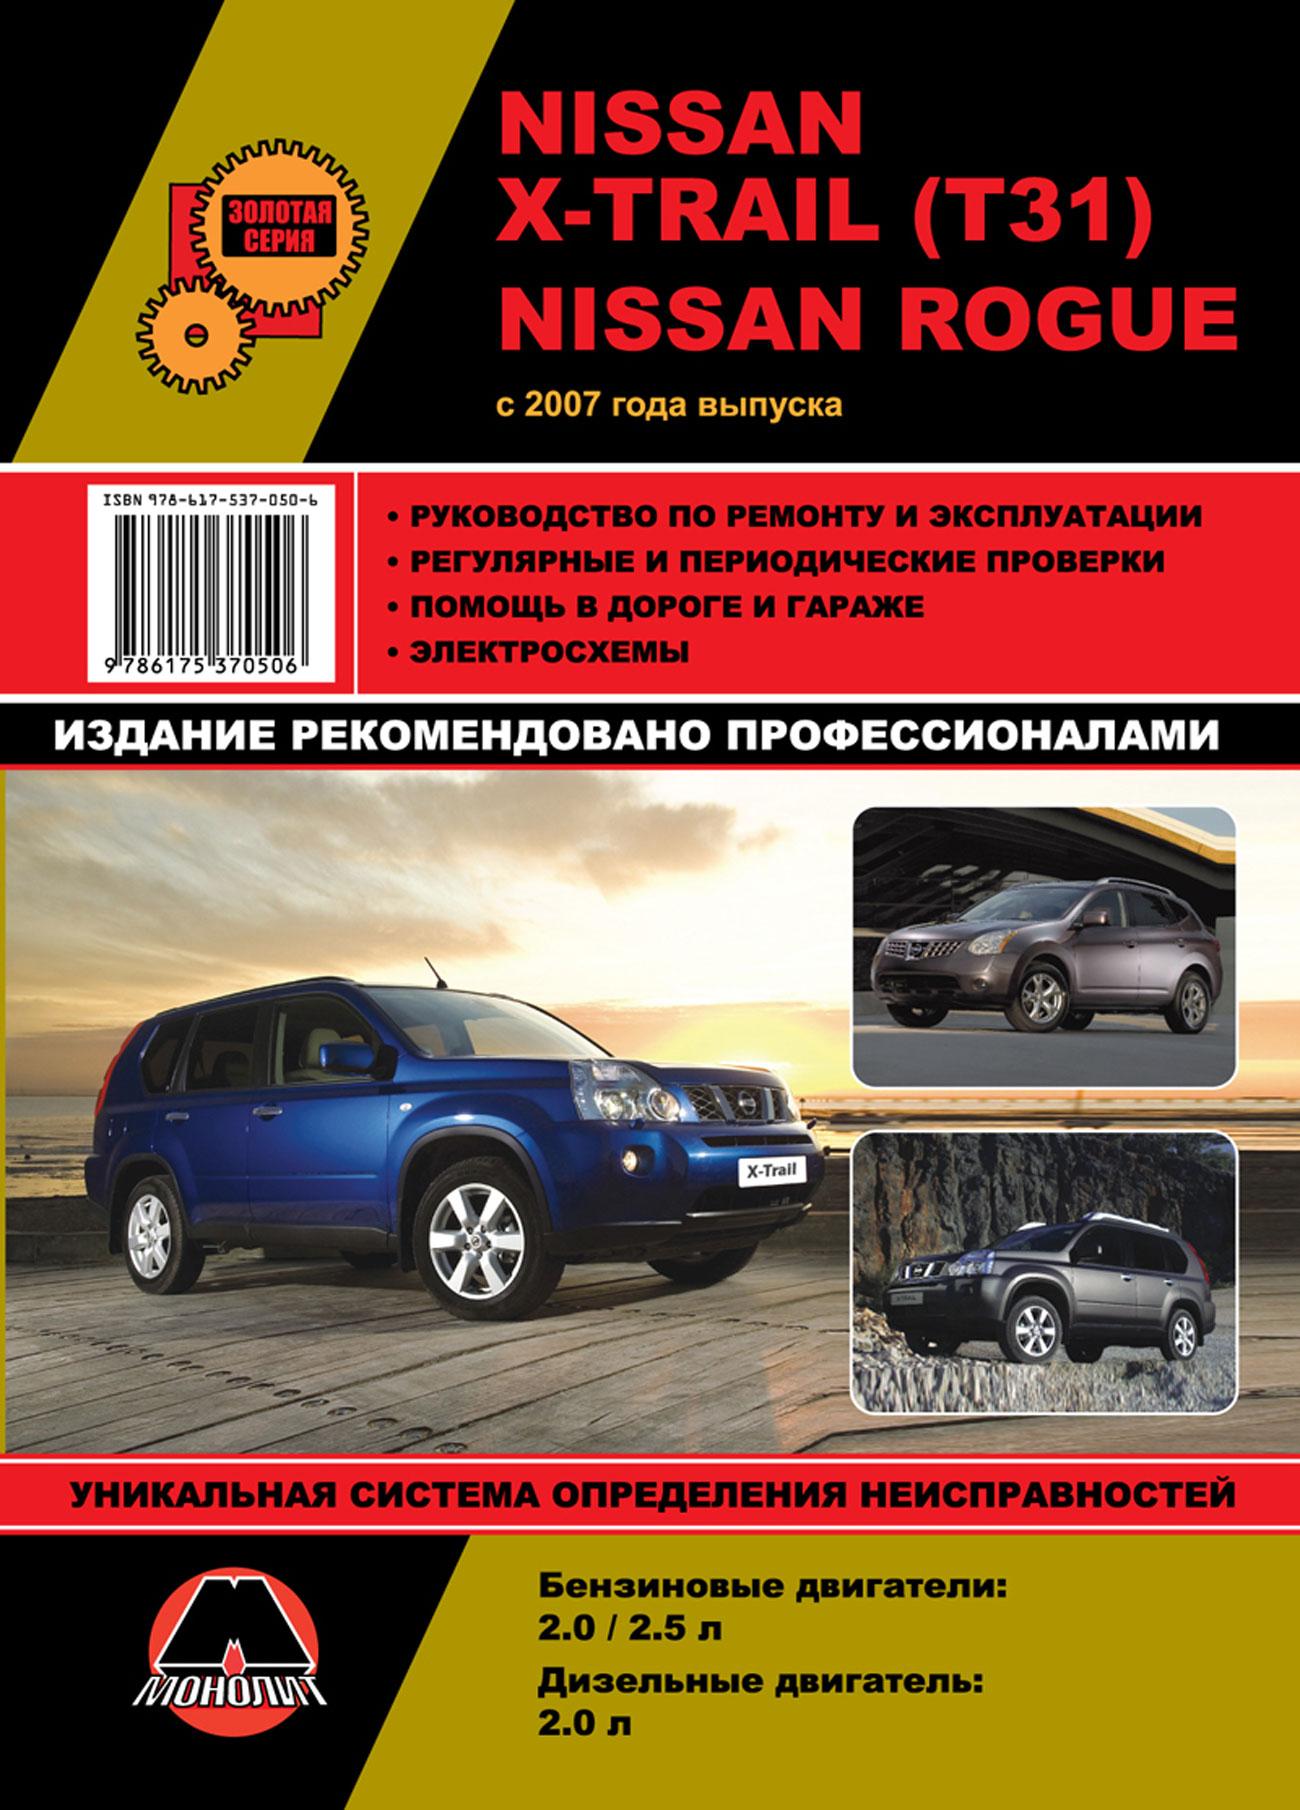 nissan x-trail руководство по ремонту и обслуживанию